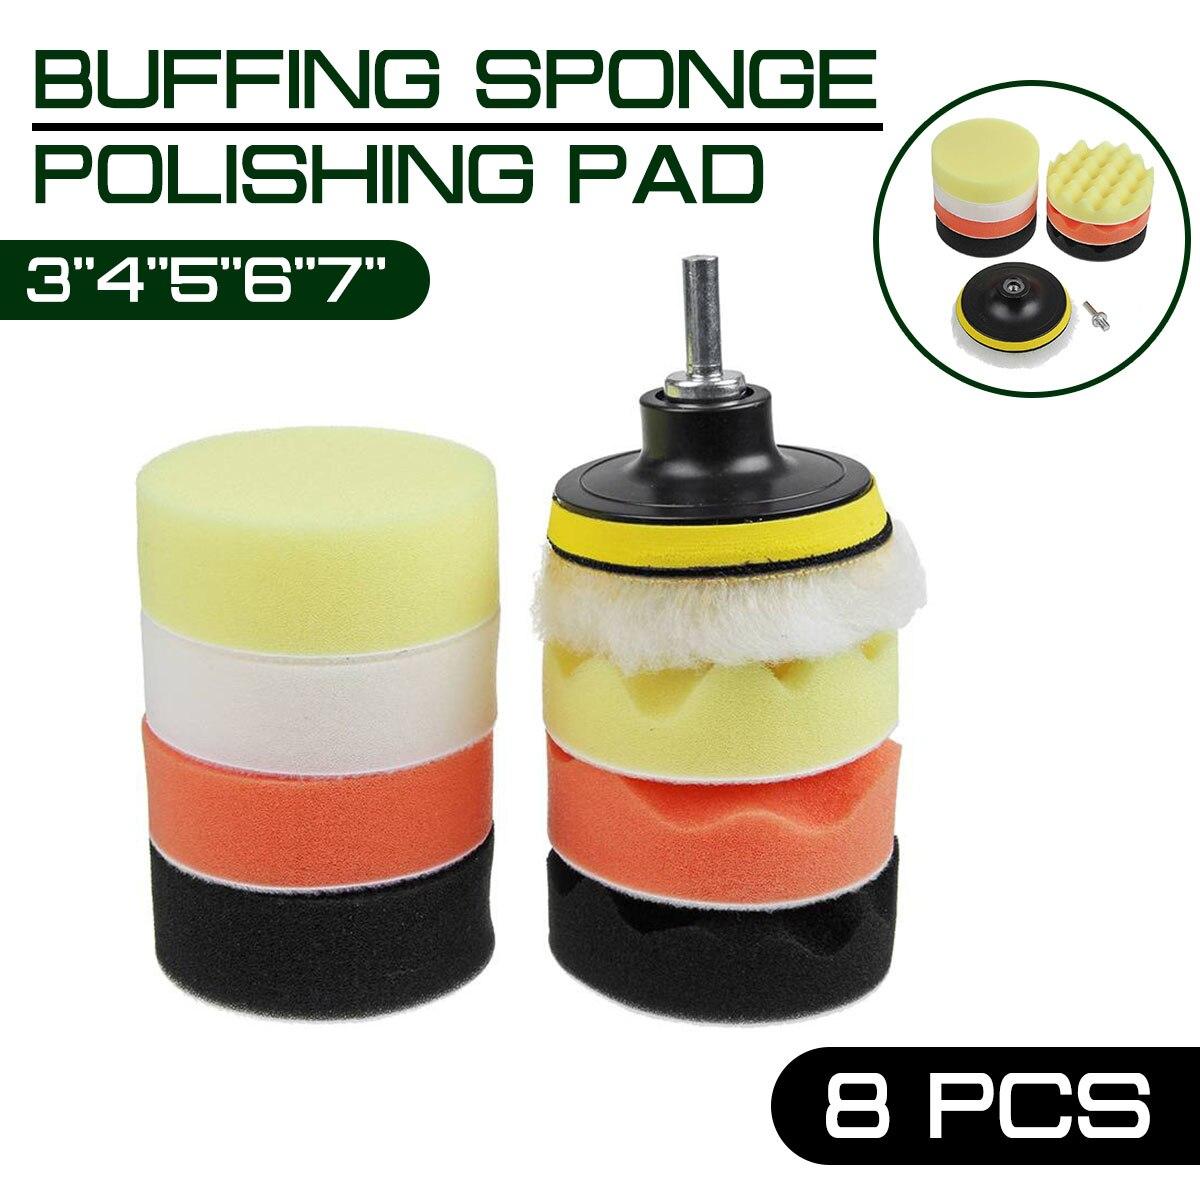 3''4''5''6''7'' 10pcs Buffing Sponge Polishing Pad Hand Tool Kit For Car Polisher Compound Polishing